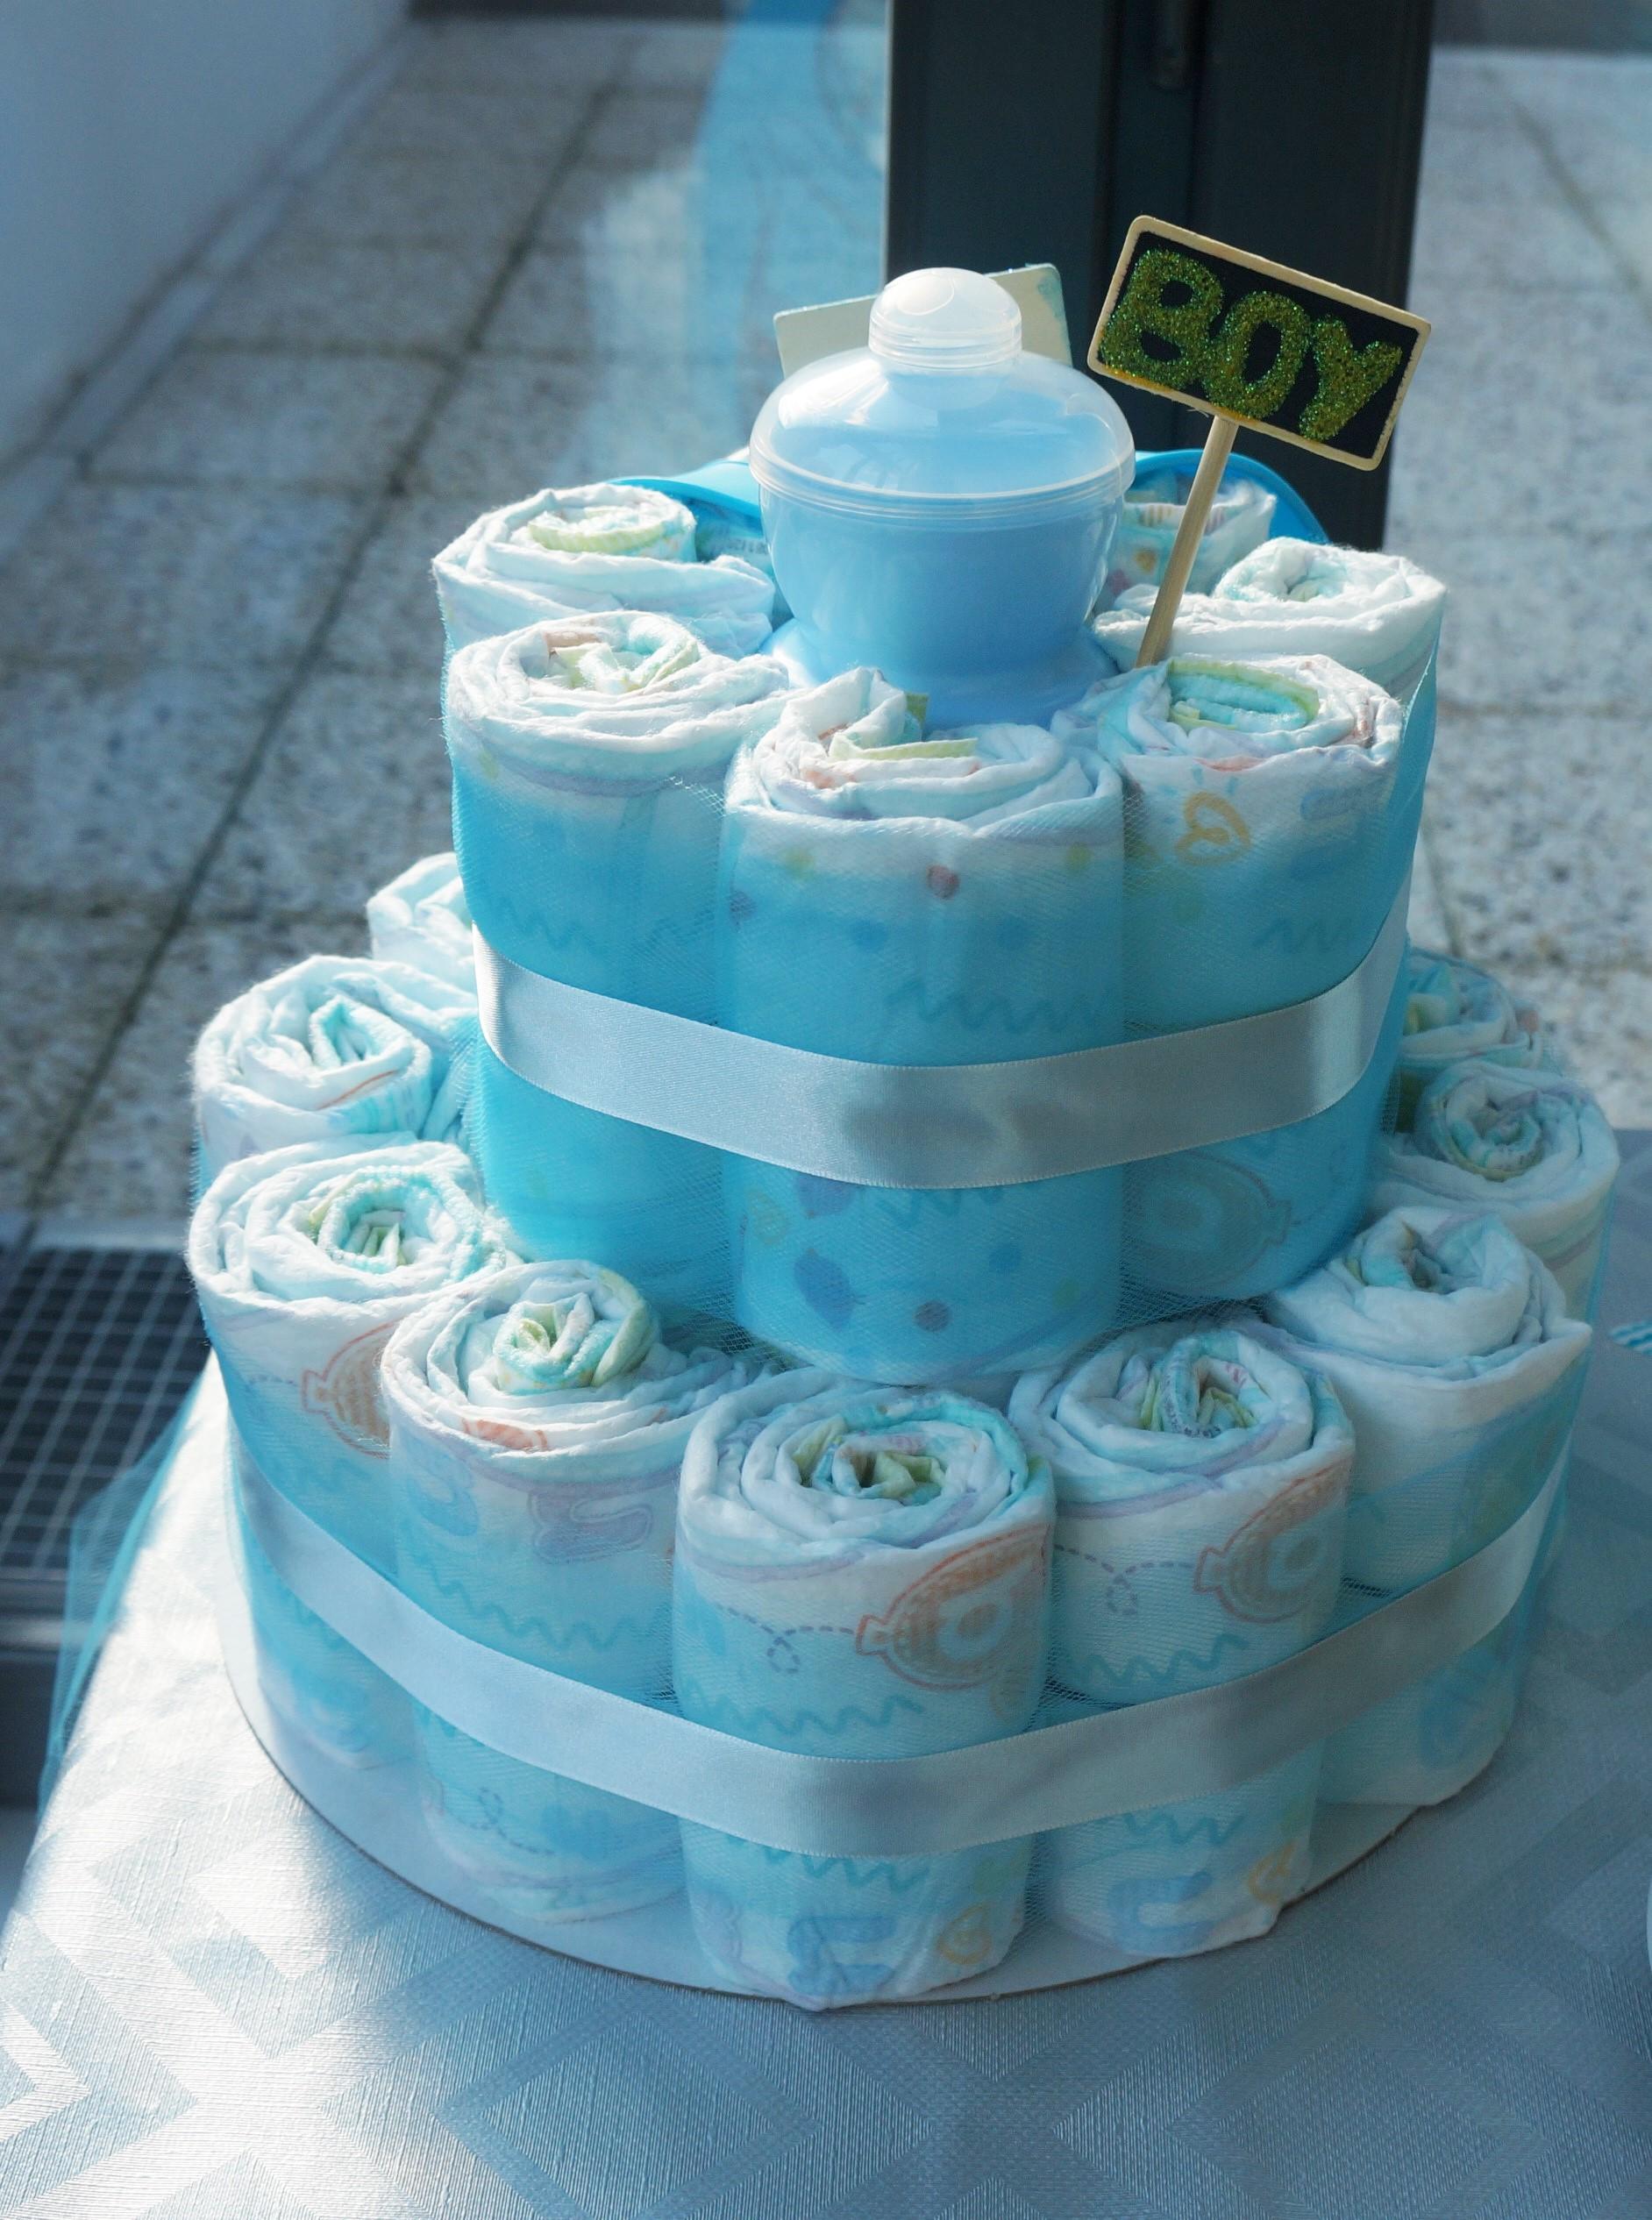 Gâteau de couches bleu garçon